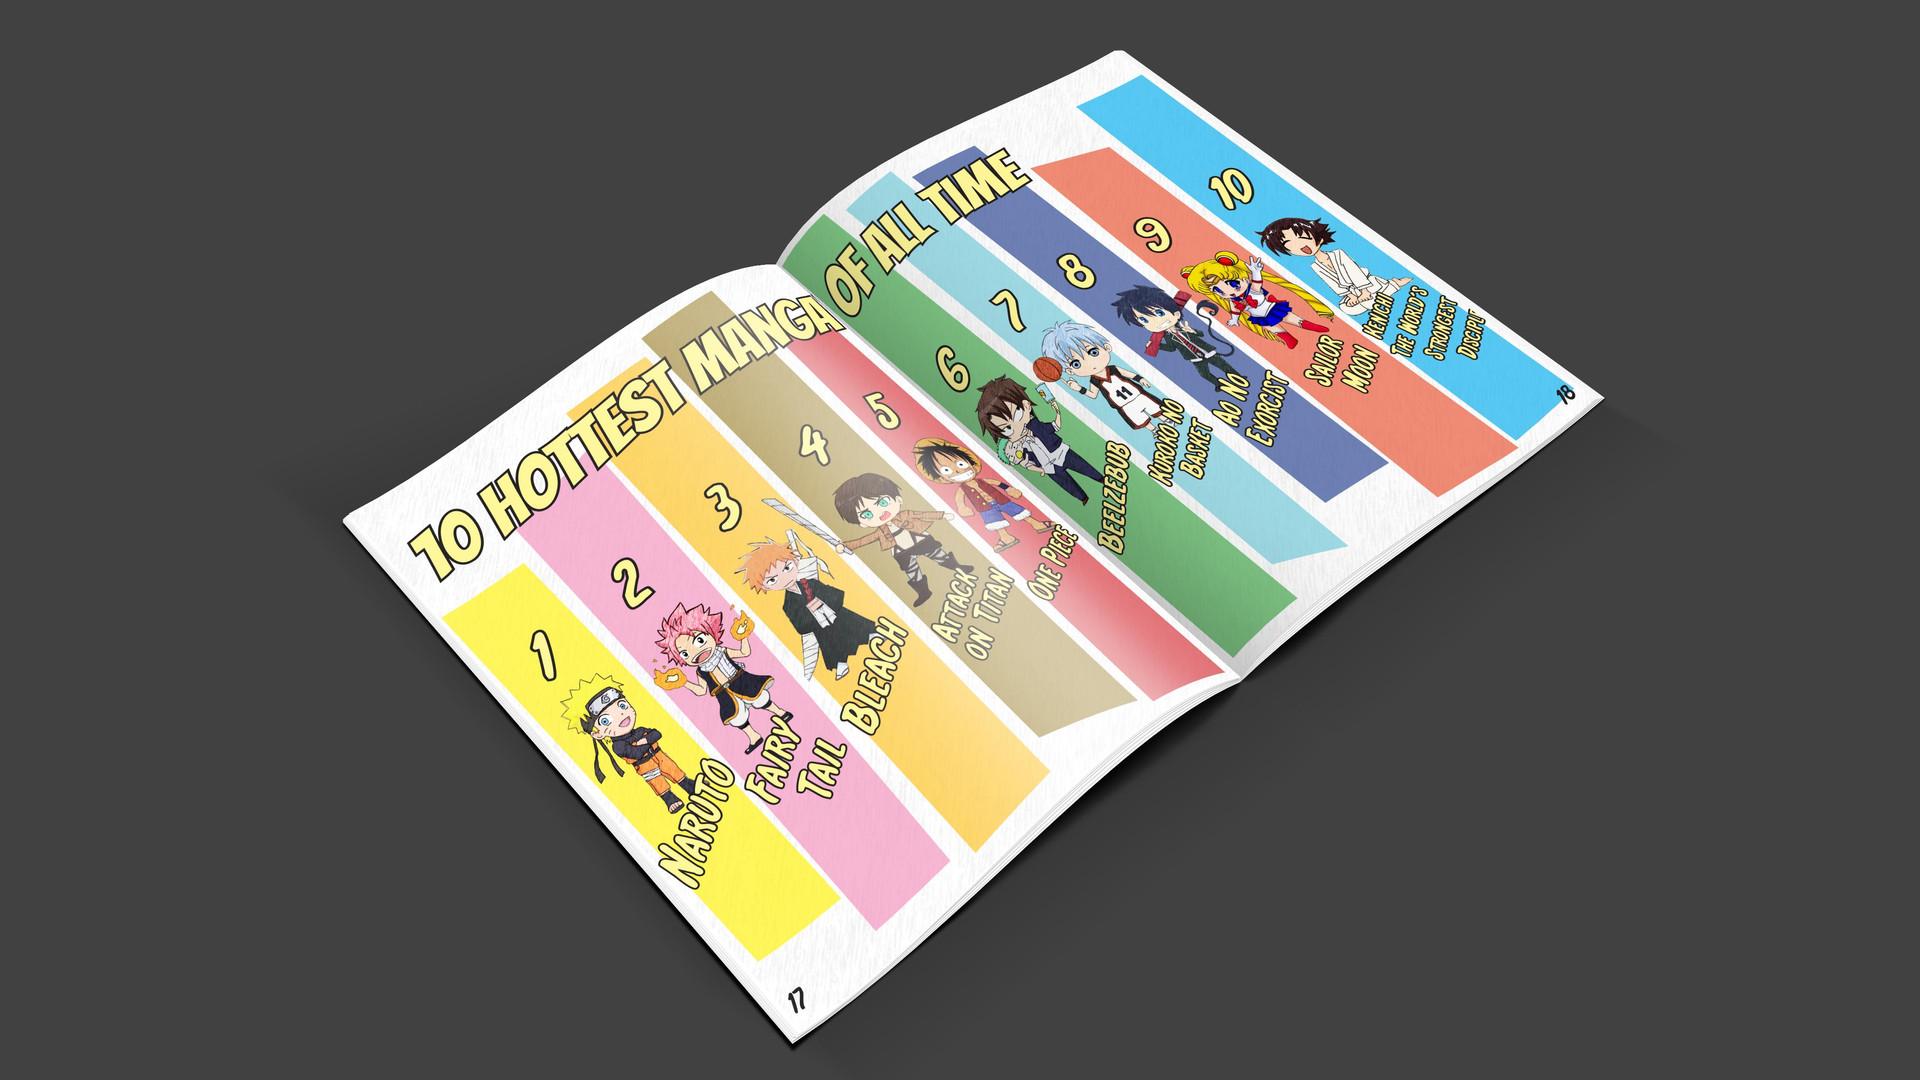 hot manga mockup.jpg